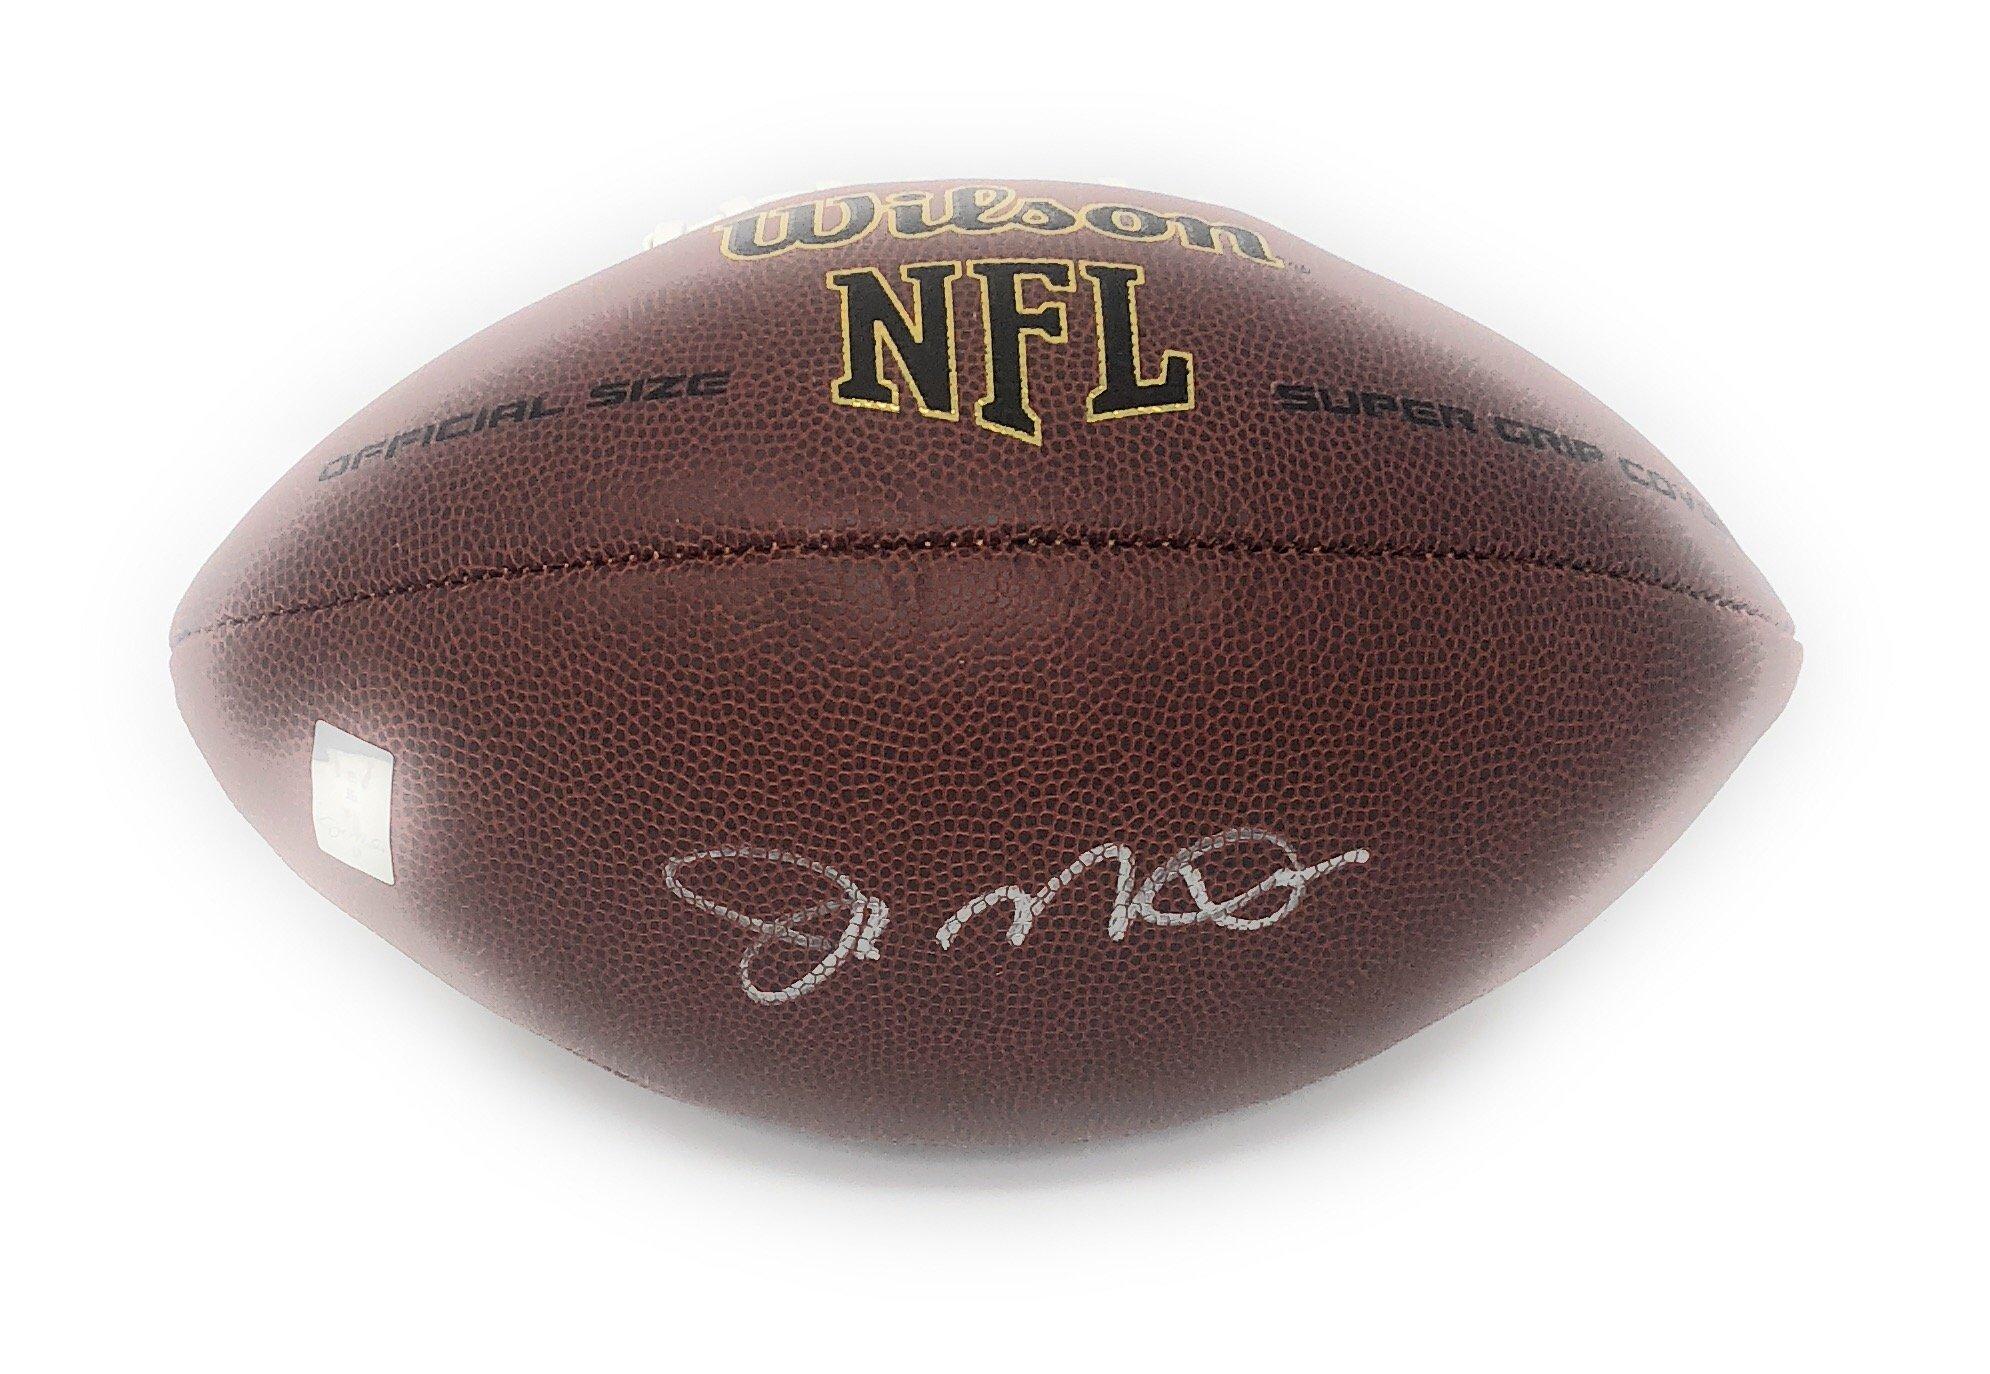 Joe Montana San Francisco 49ers Signed Autograph Football Montana GTSM Player Hologram